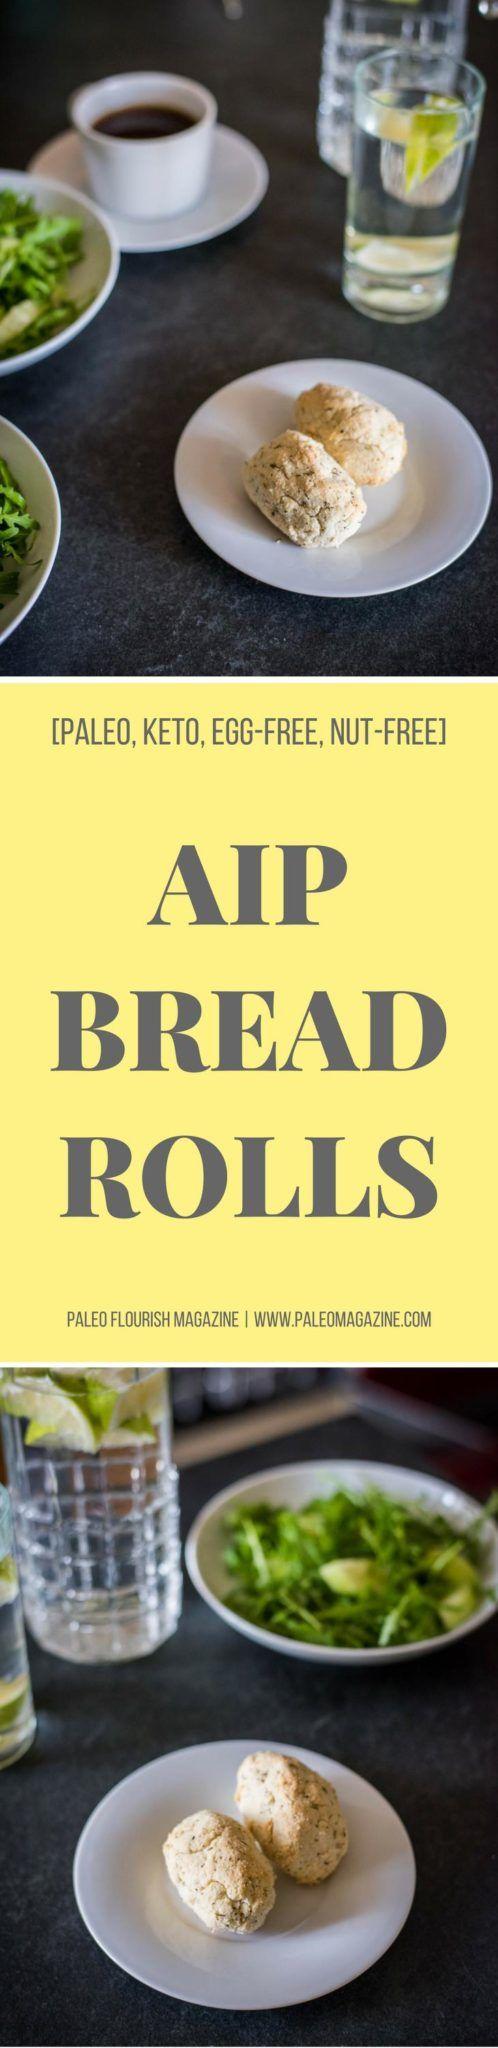 AIP Bread Rolls Recipe